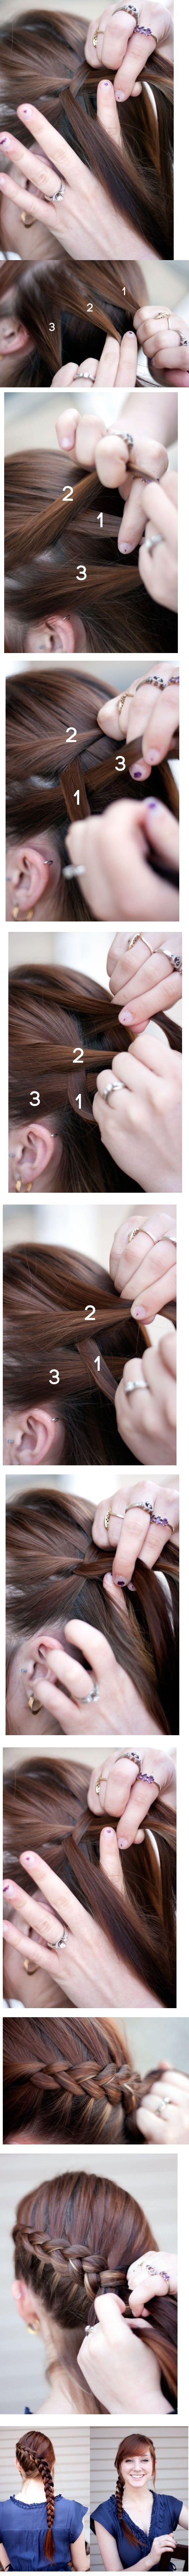 Pin by alexa pinto on cool pinterest katniss braid dutch braids